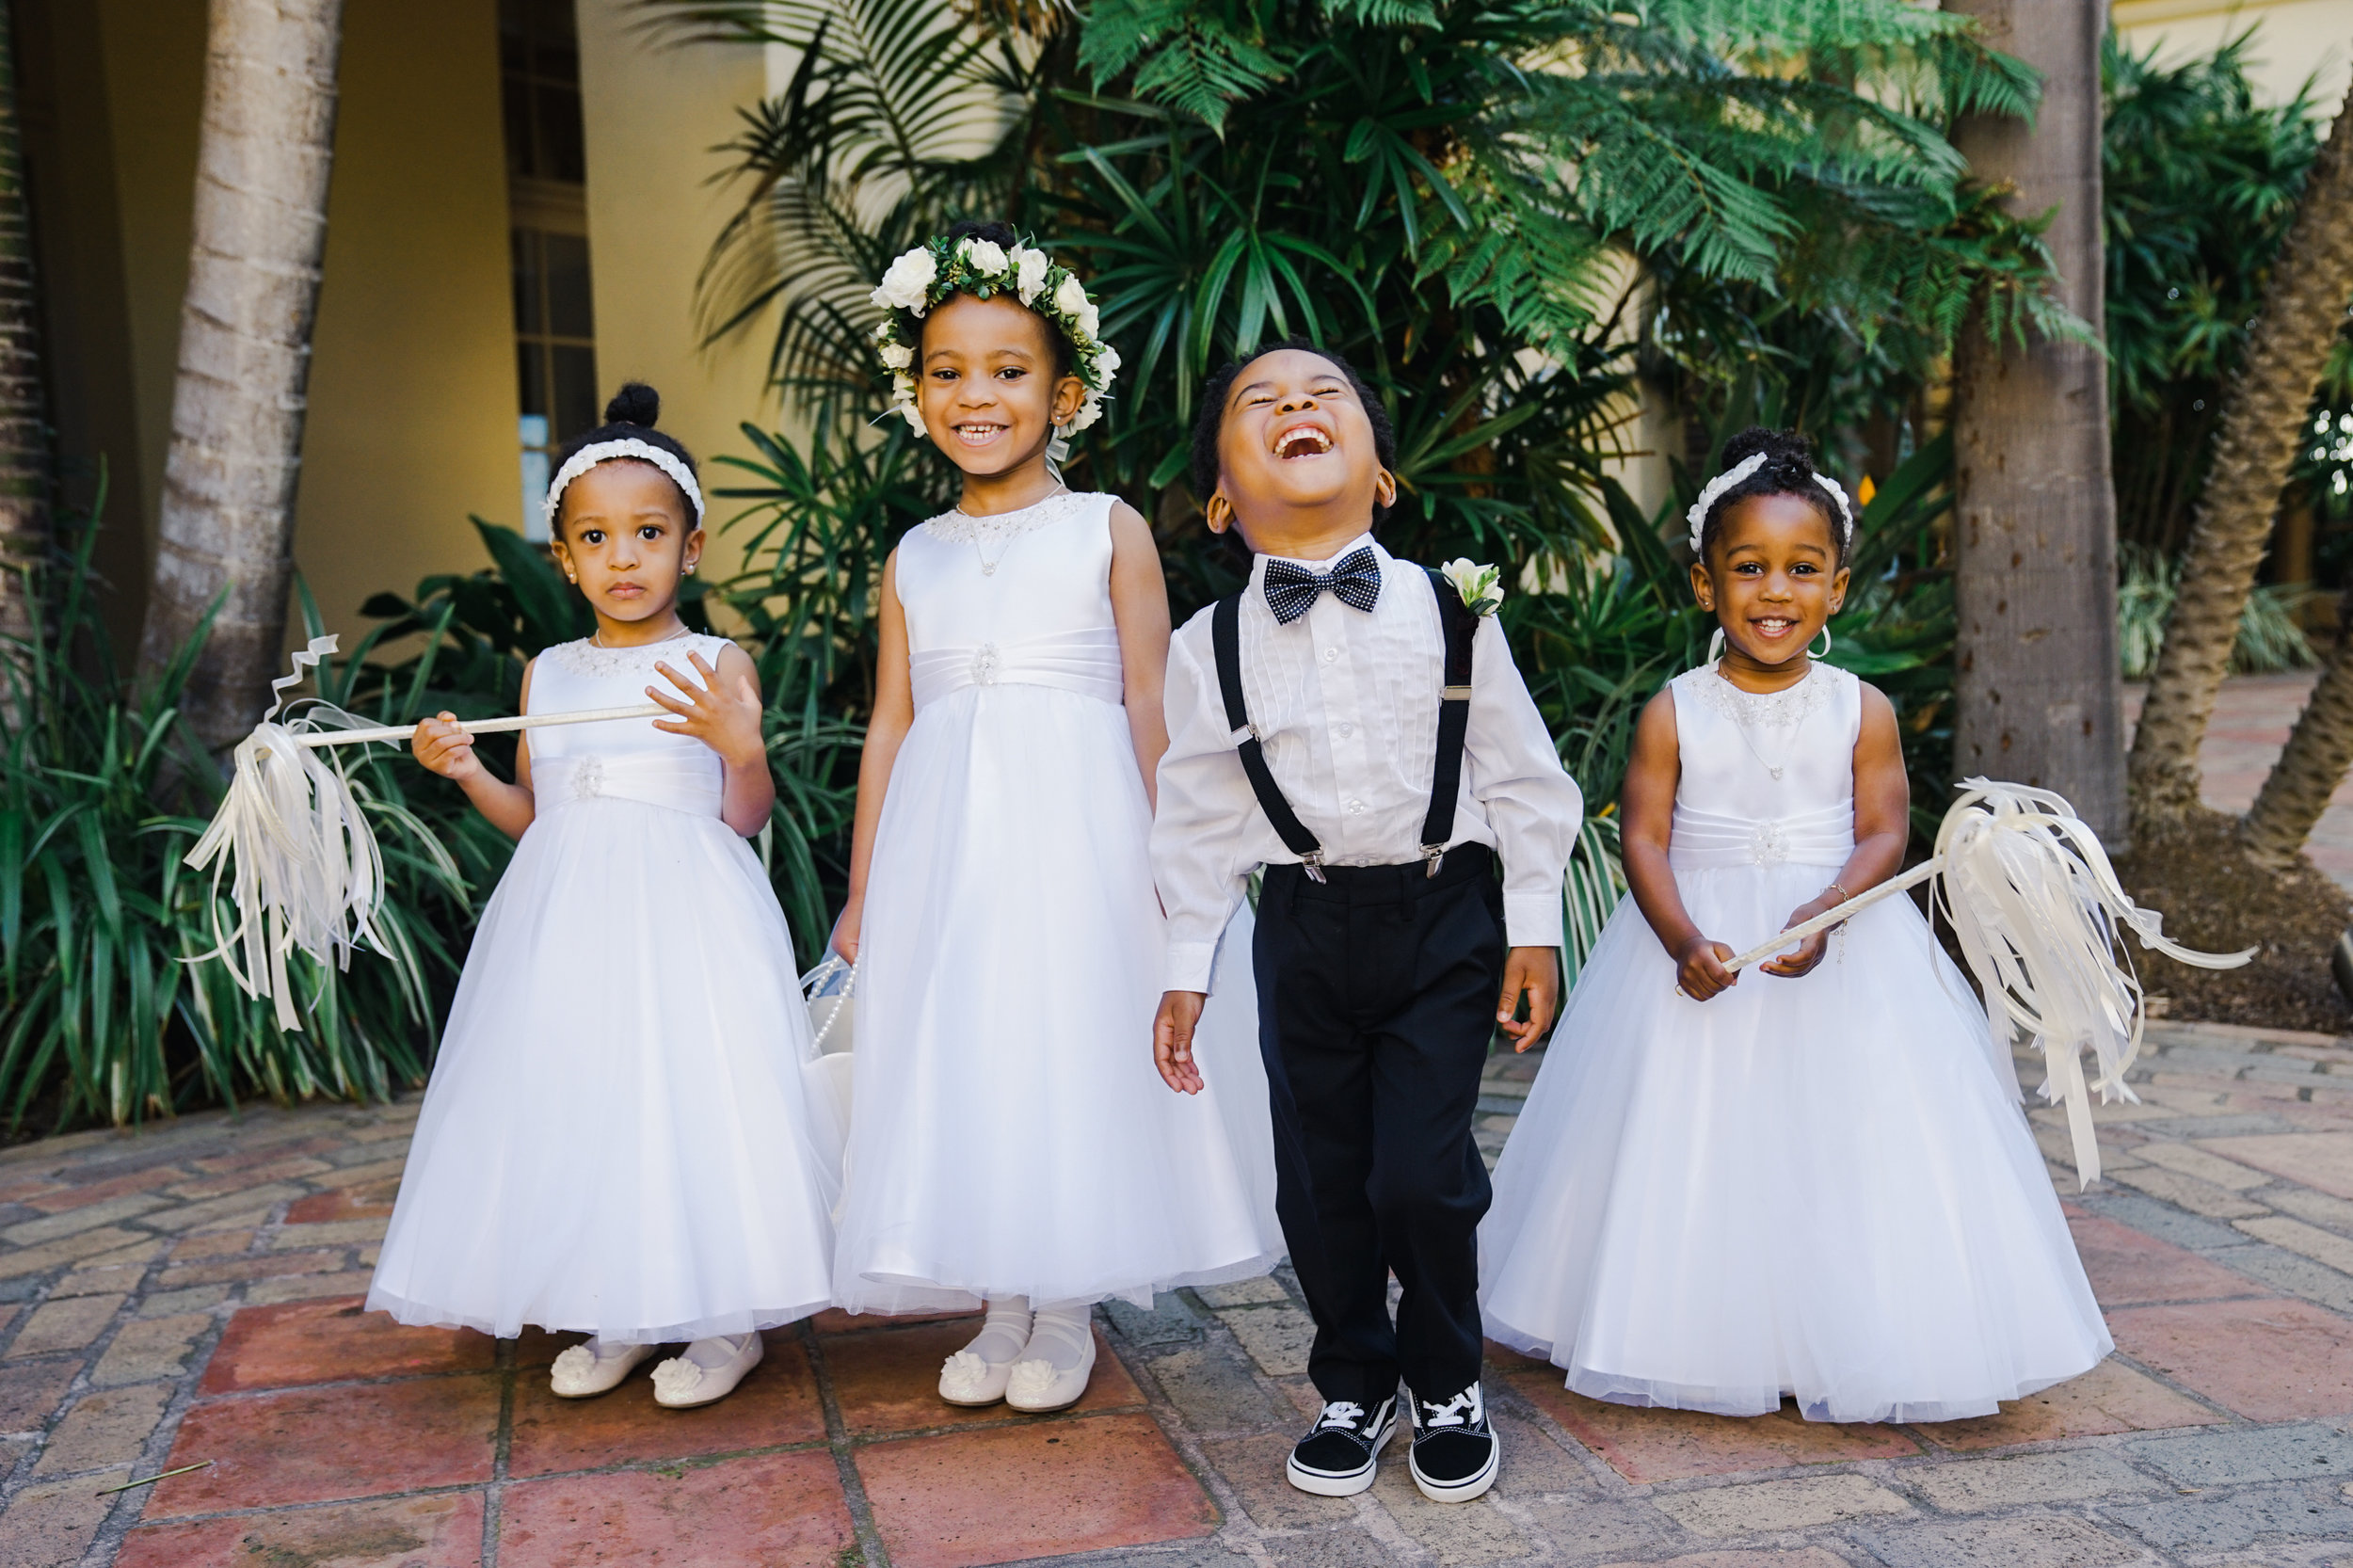 ritz-carlton-laguna-niguel-wedding-sonya_0083.JPG